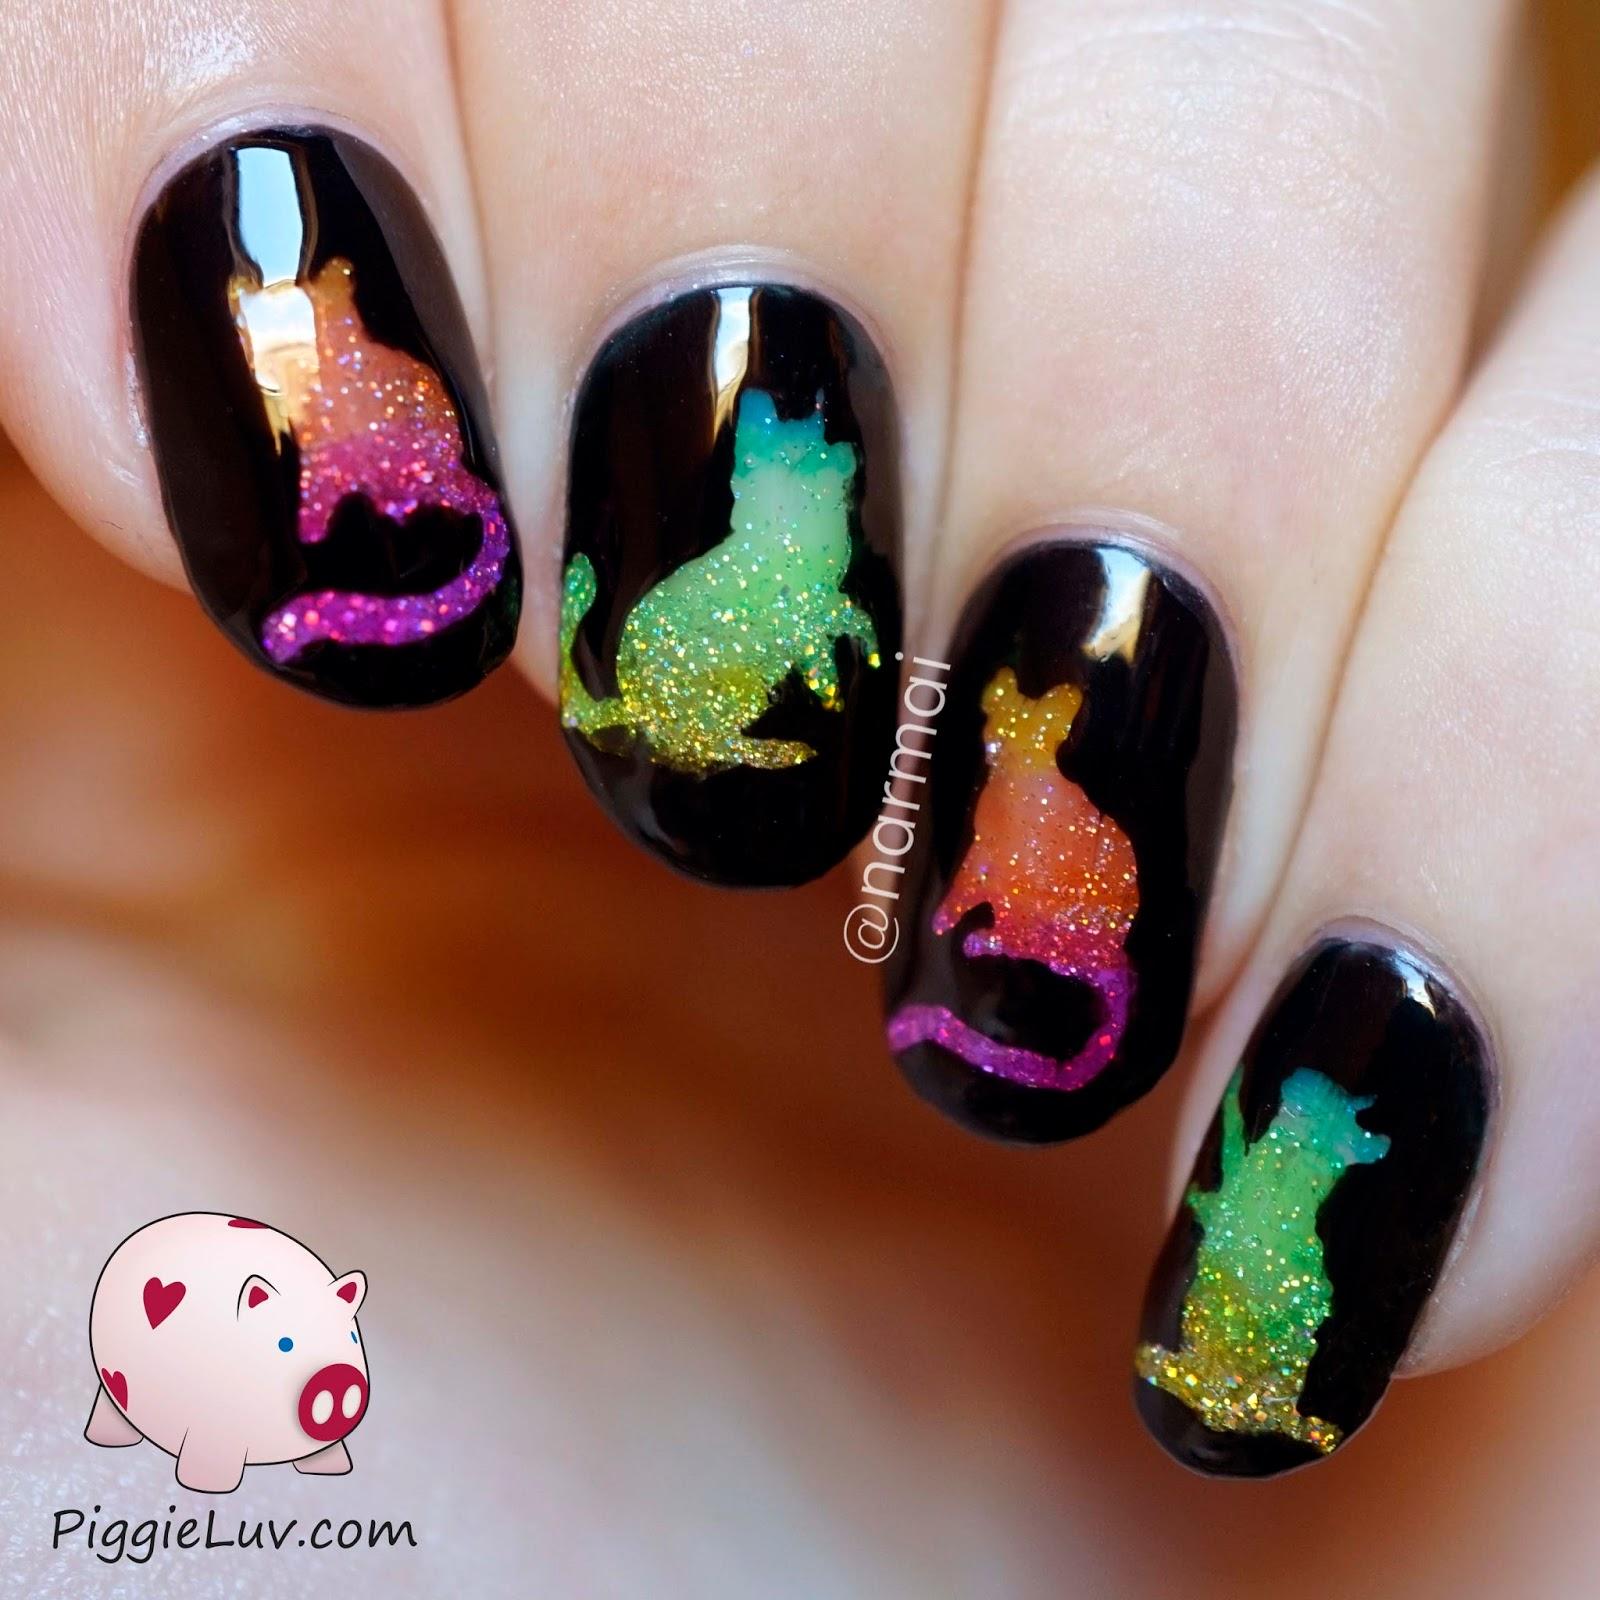 Piggieluv Rainbow Bubbles Nail Art: PiggieLuv: Glitter Rainbow Cats Nail Art With OPI Color Paints